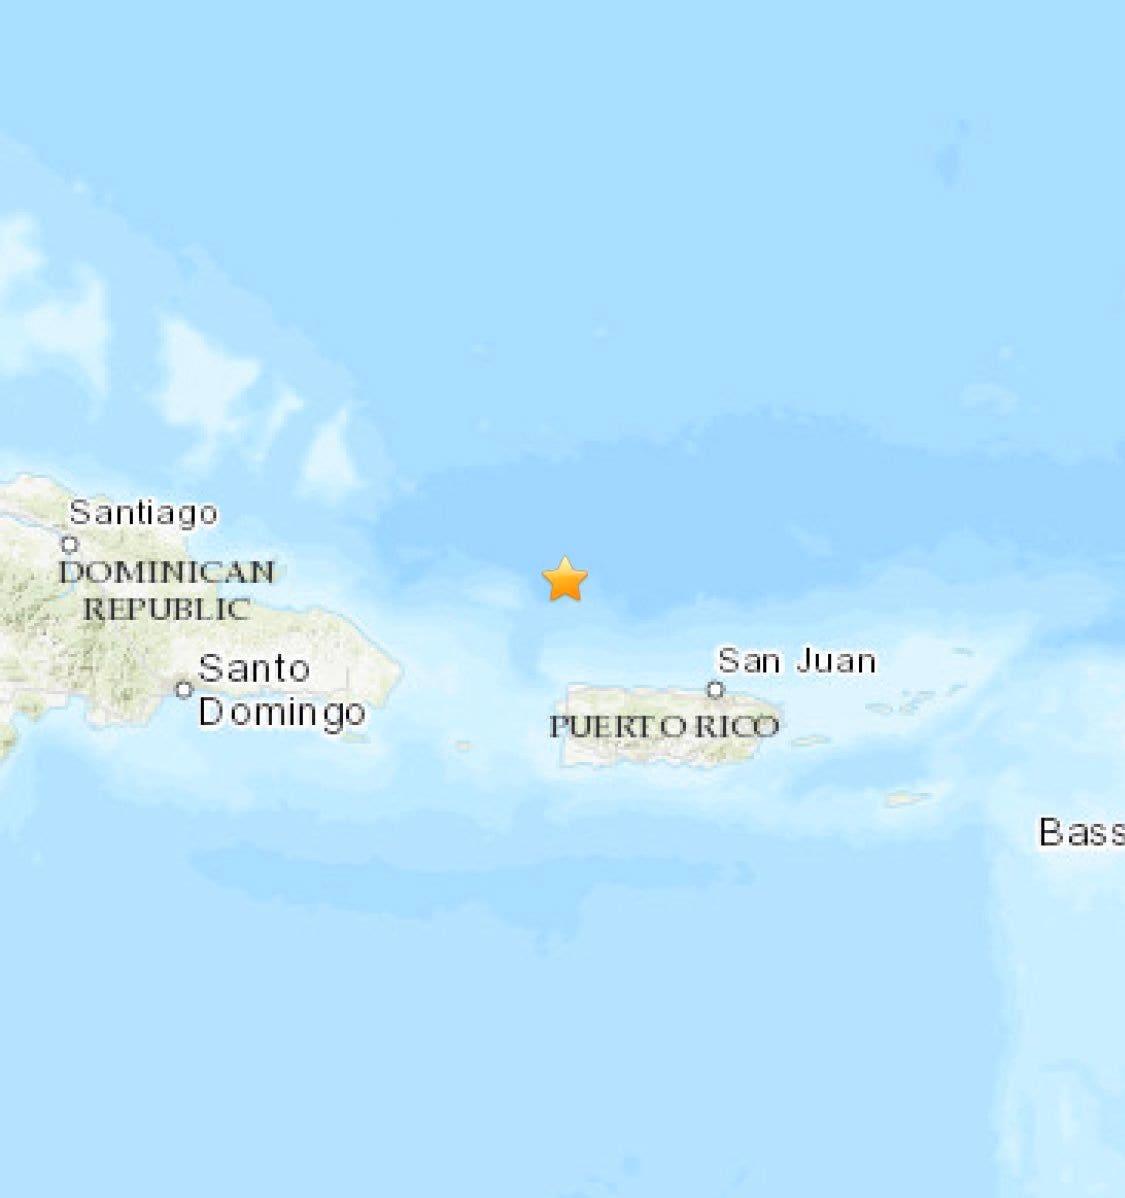 6.0-magnitude earthquake has struck near Puerto Rico, rousing many from their sleep